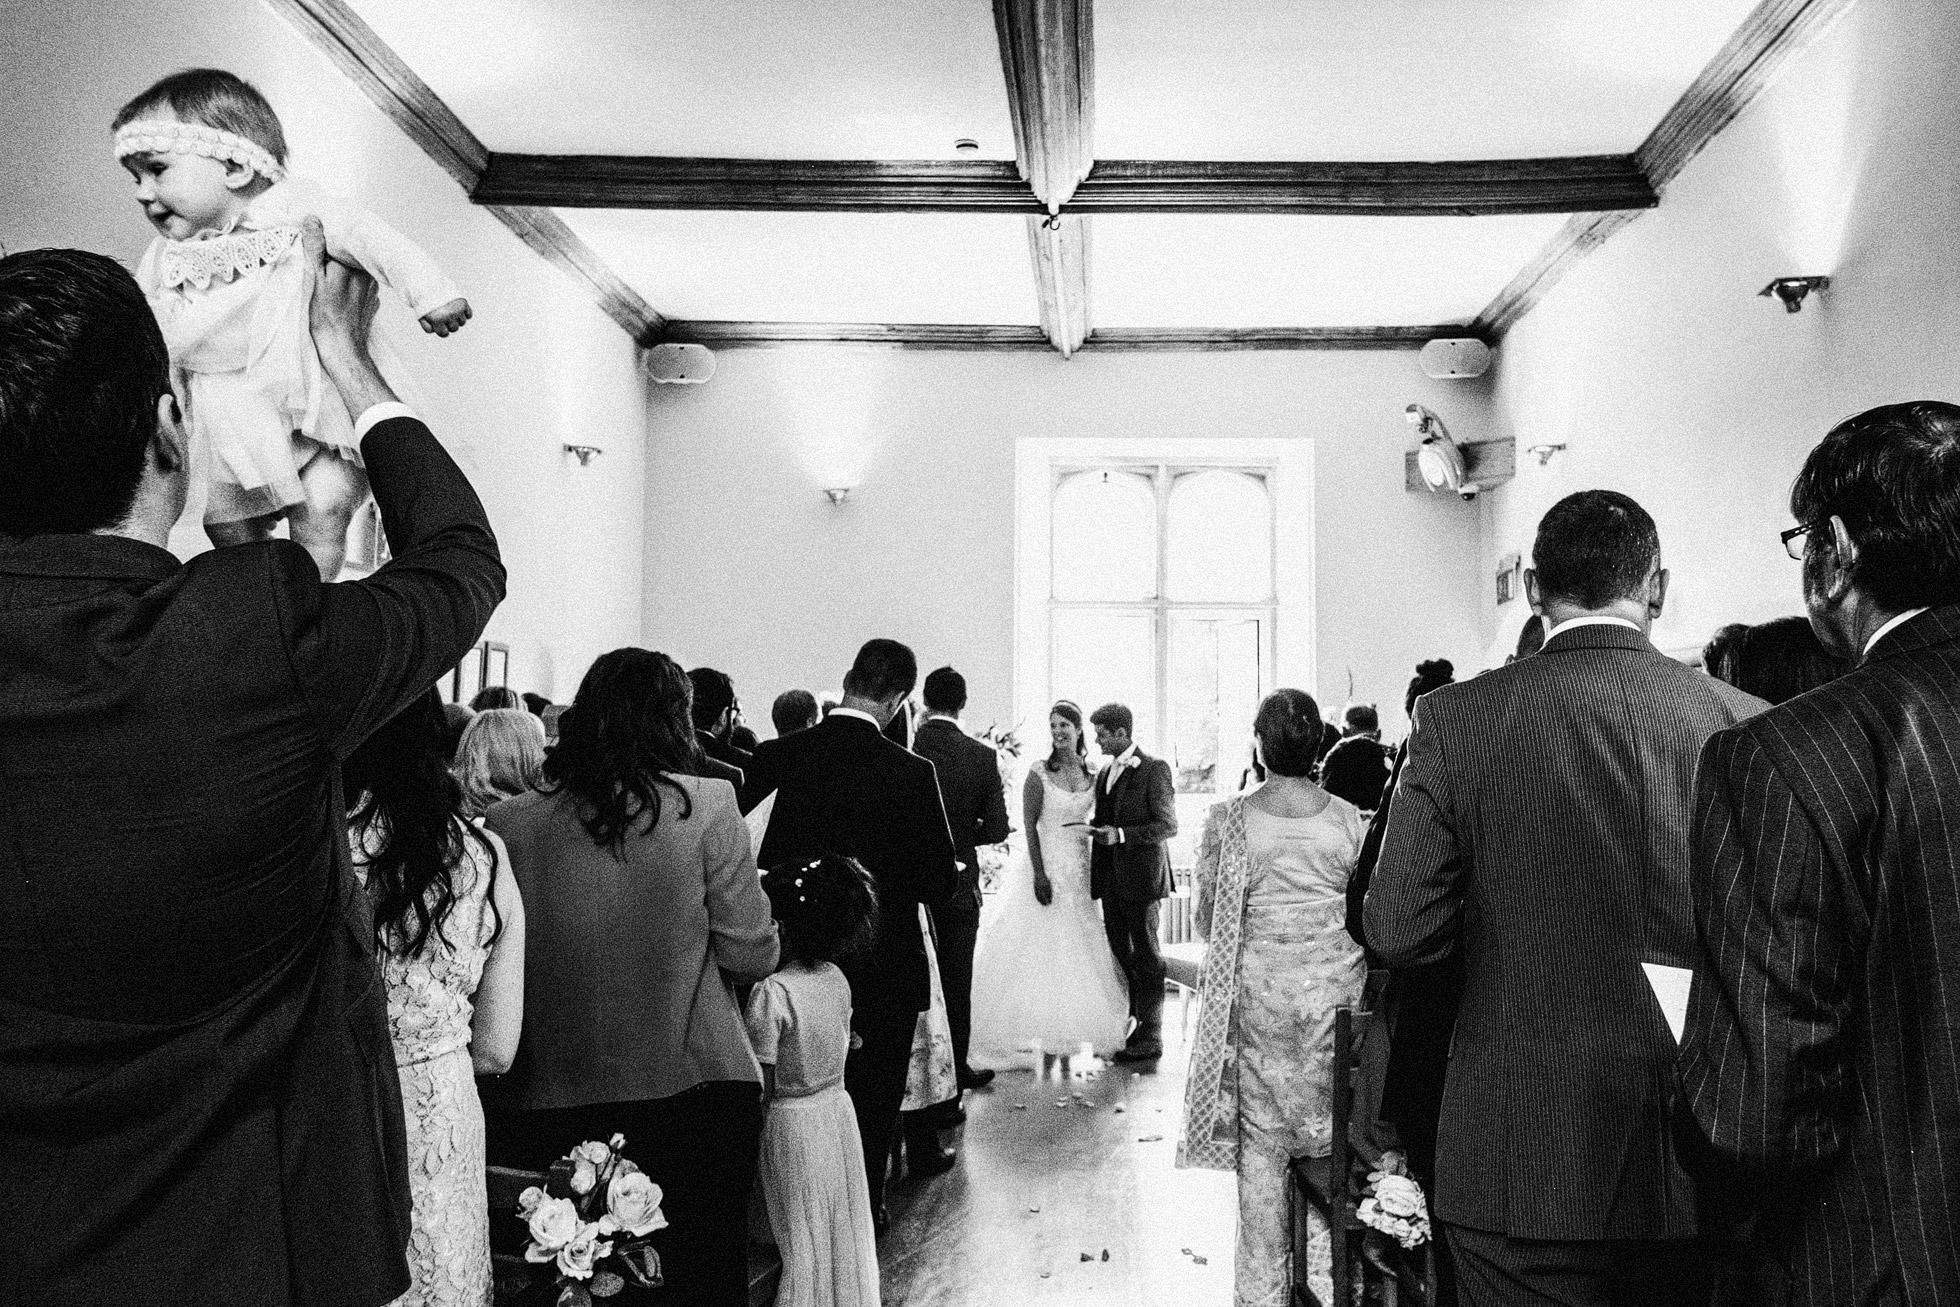 Notley Abbey Wedding Ceremony